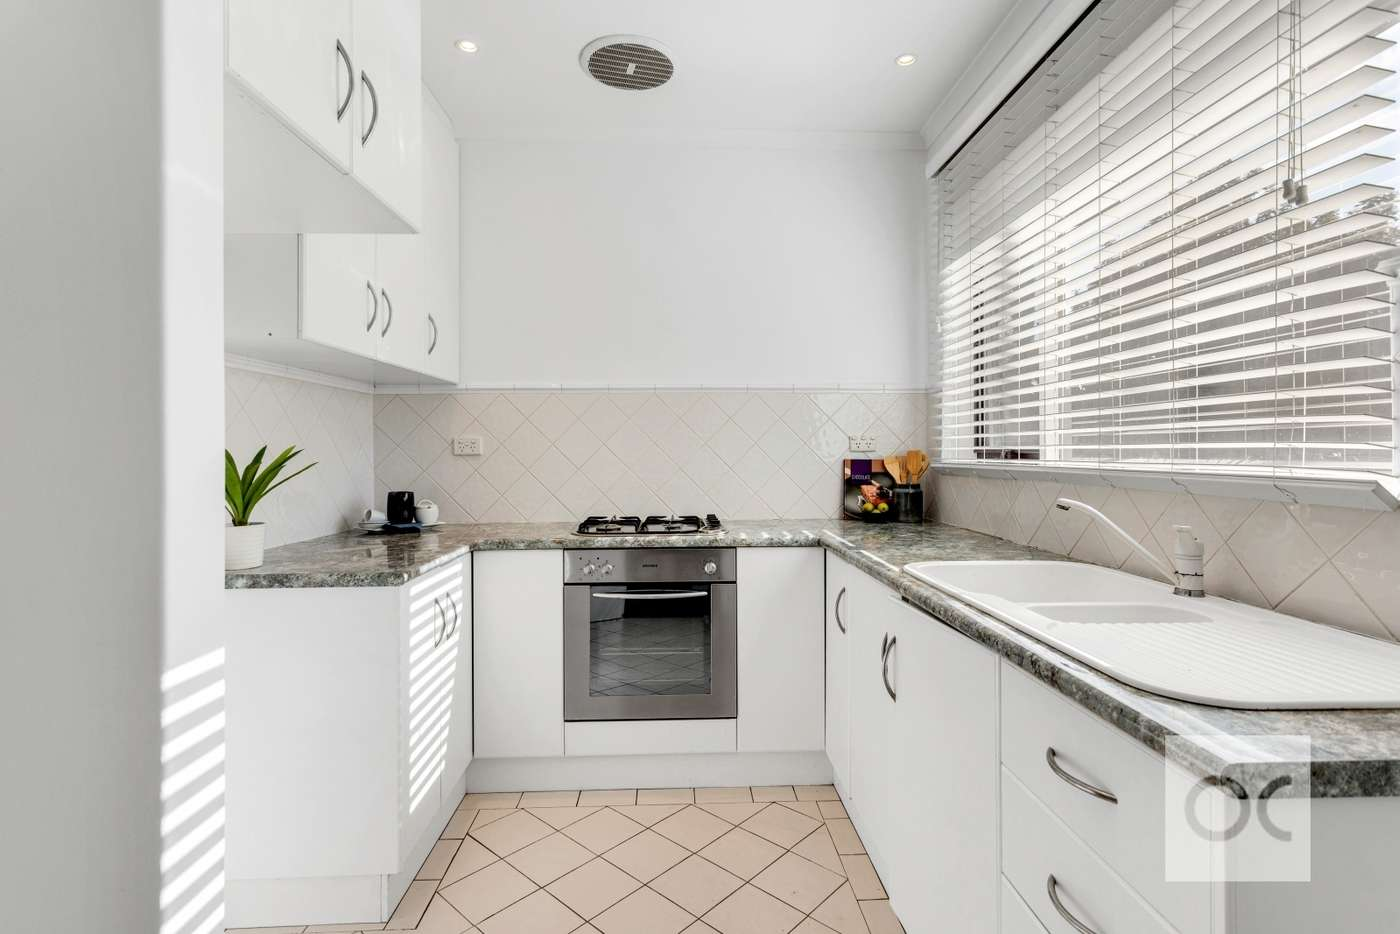 Fifth view of Homely unit listing, 1/5 Dawson Street, Fullarton SA 5063